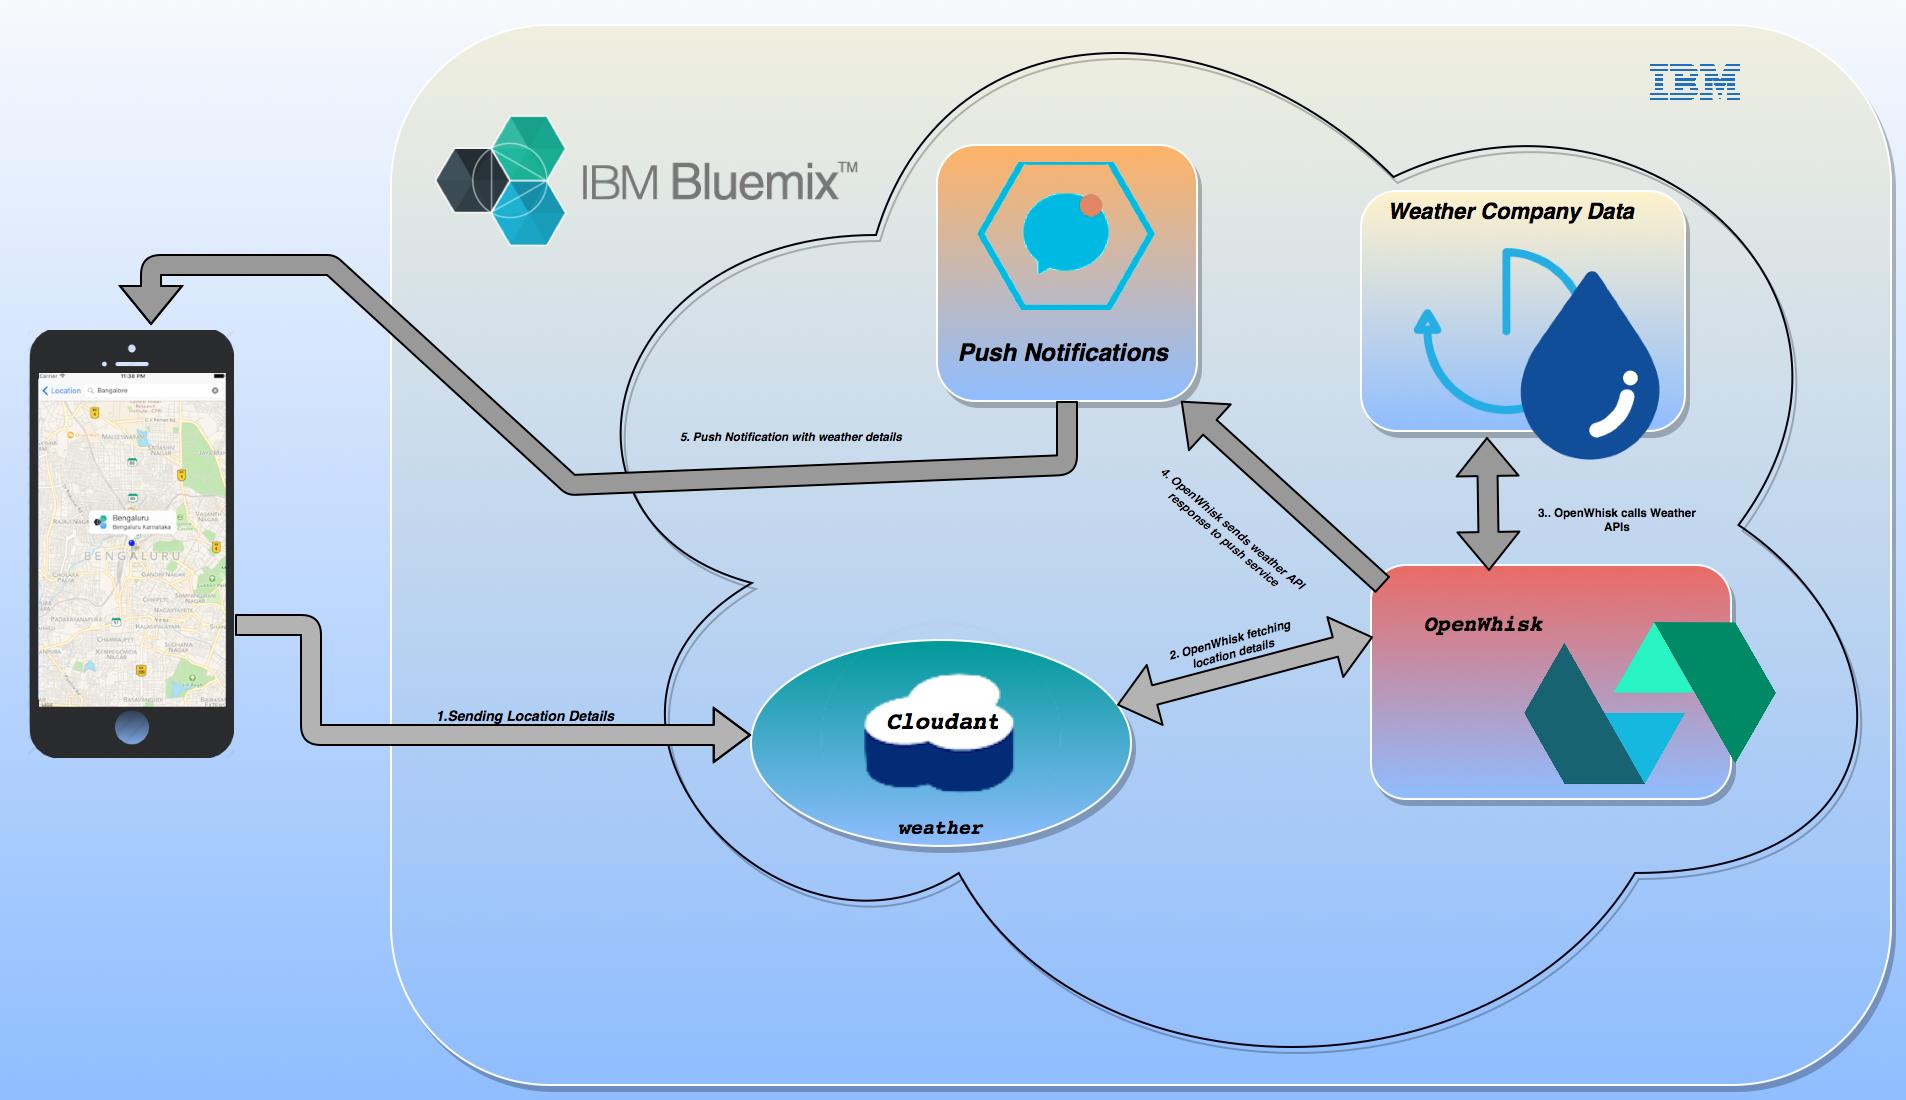 Weather alerts using IBM Bluemix Push Notification service